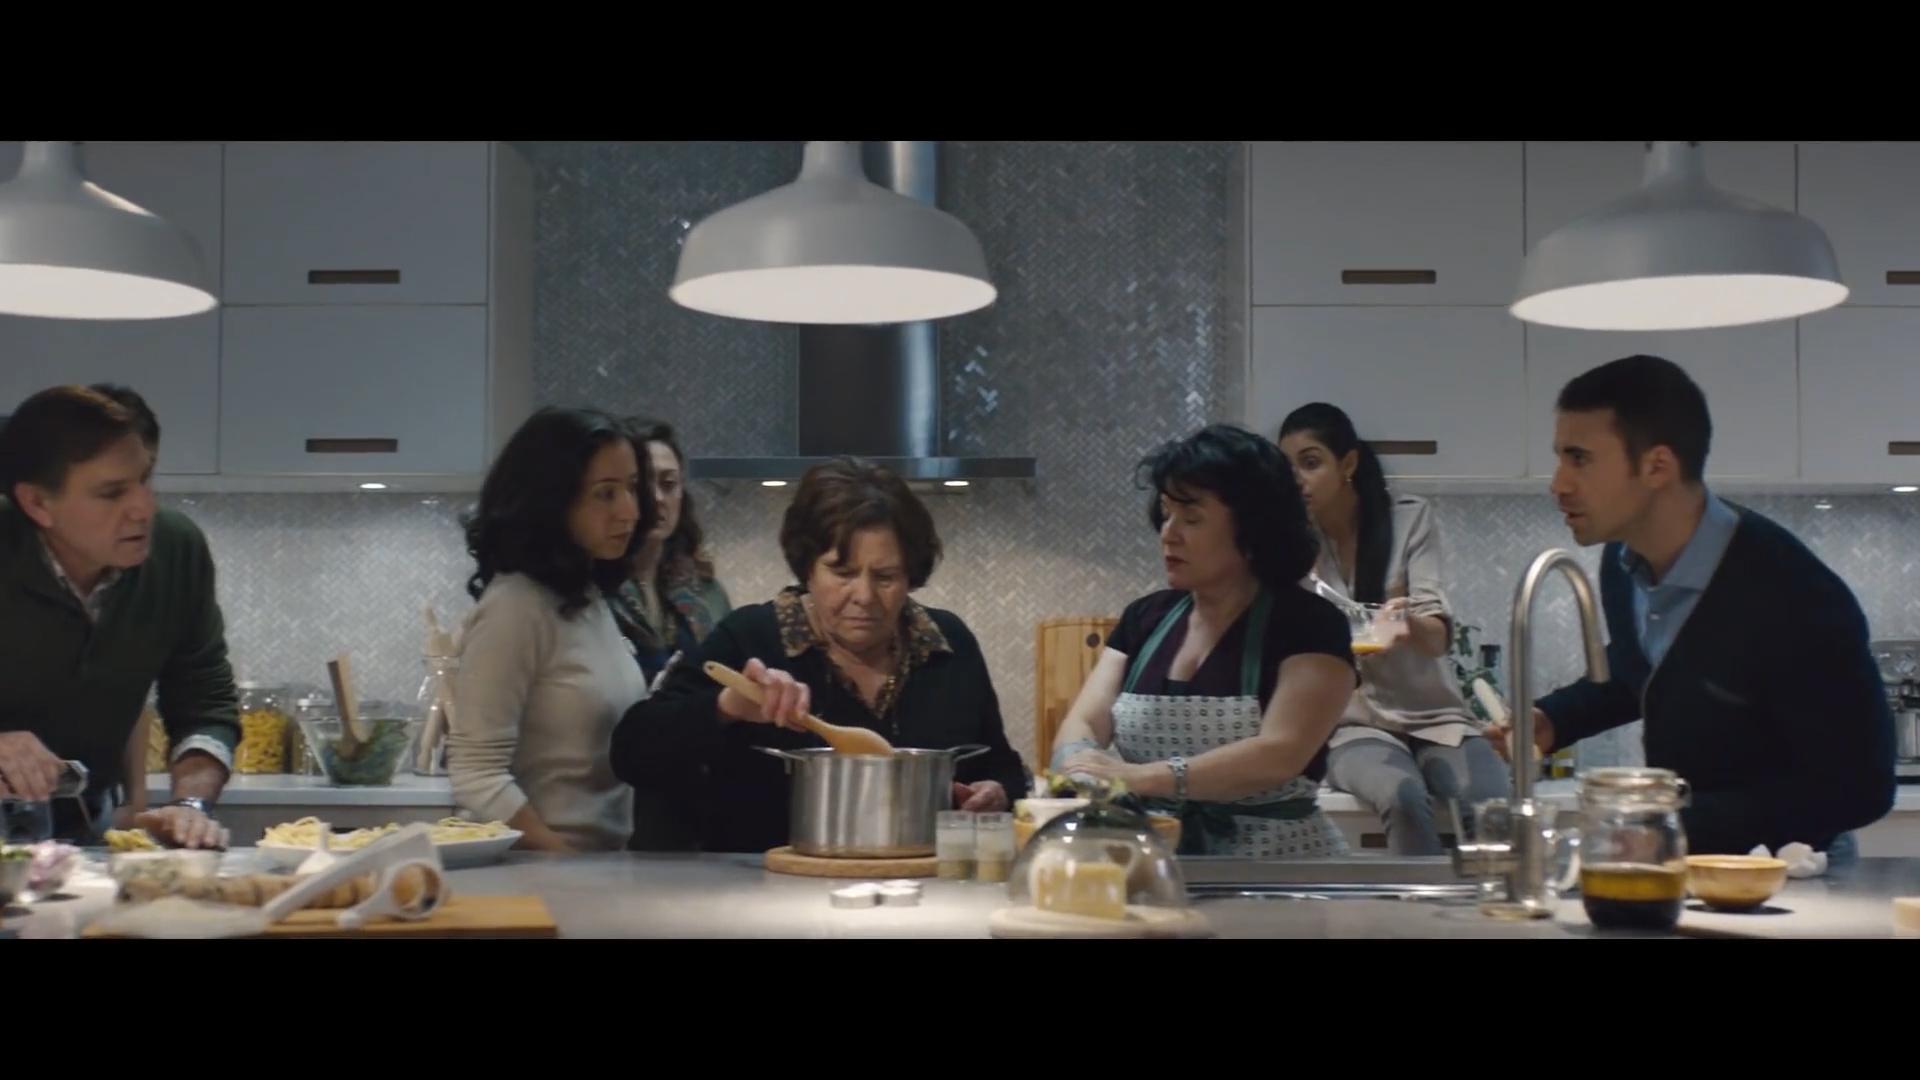 Nonna II - IKEA Canada